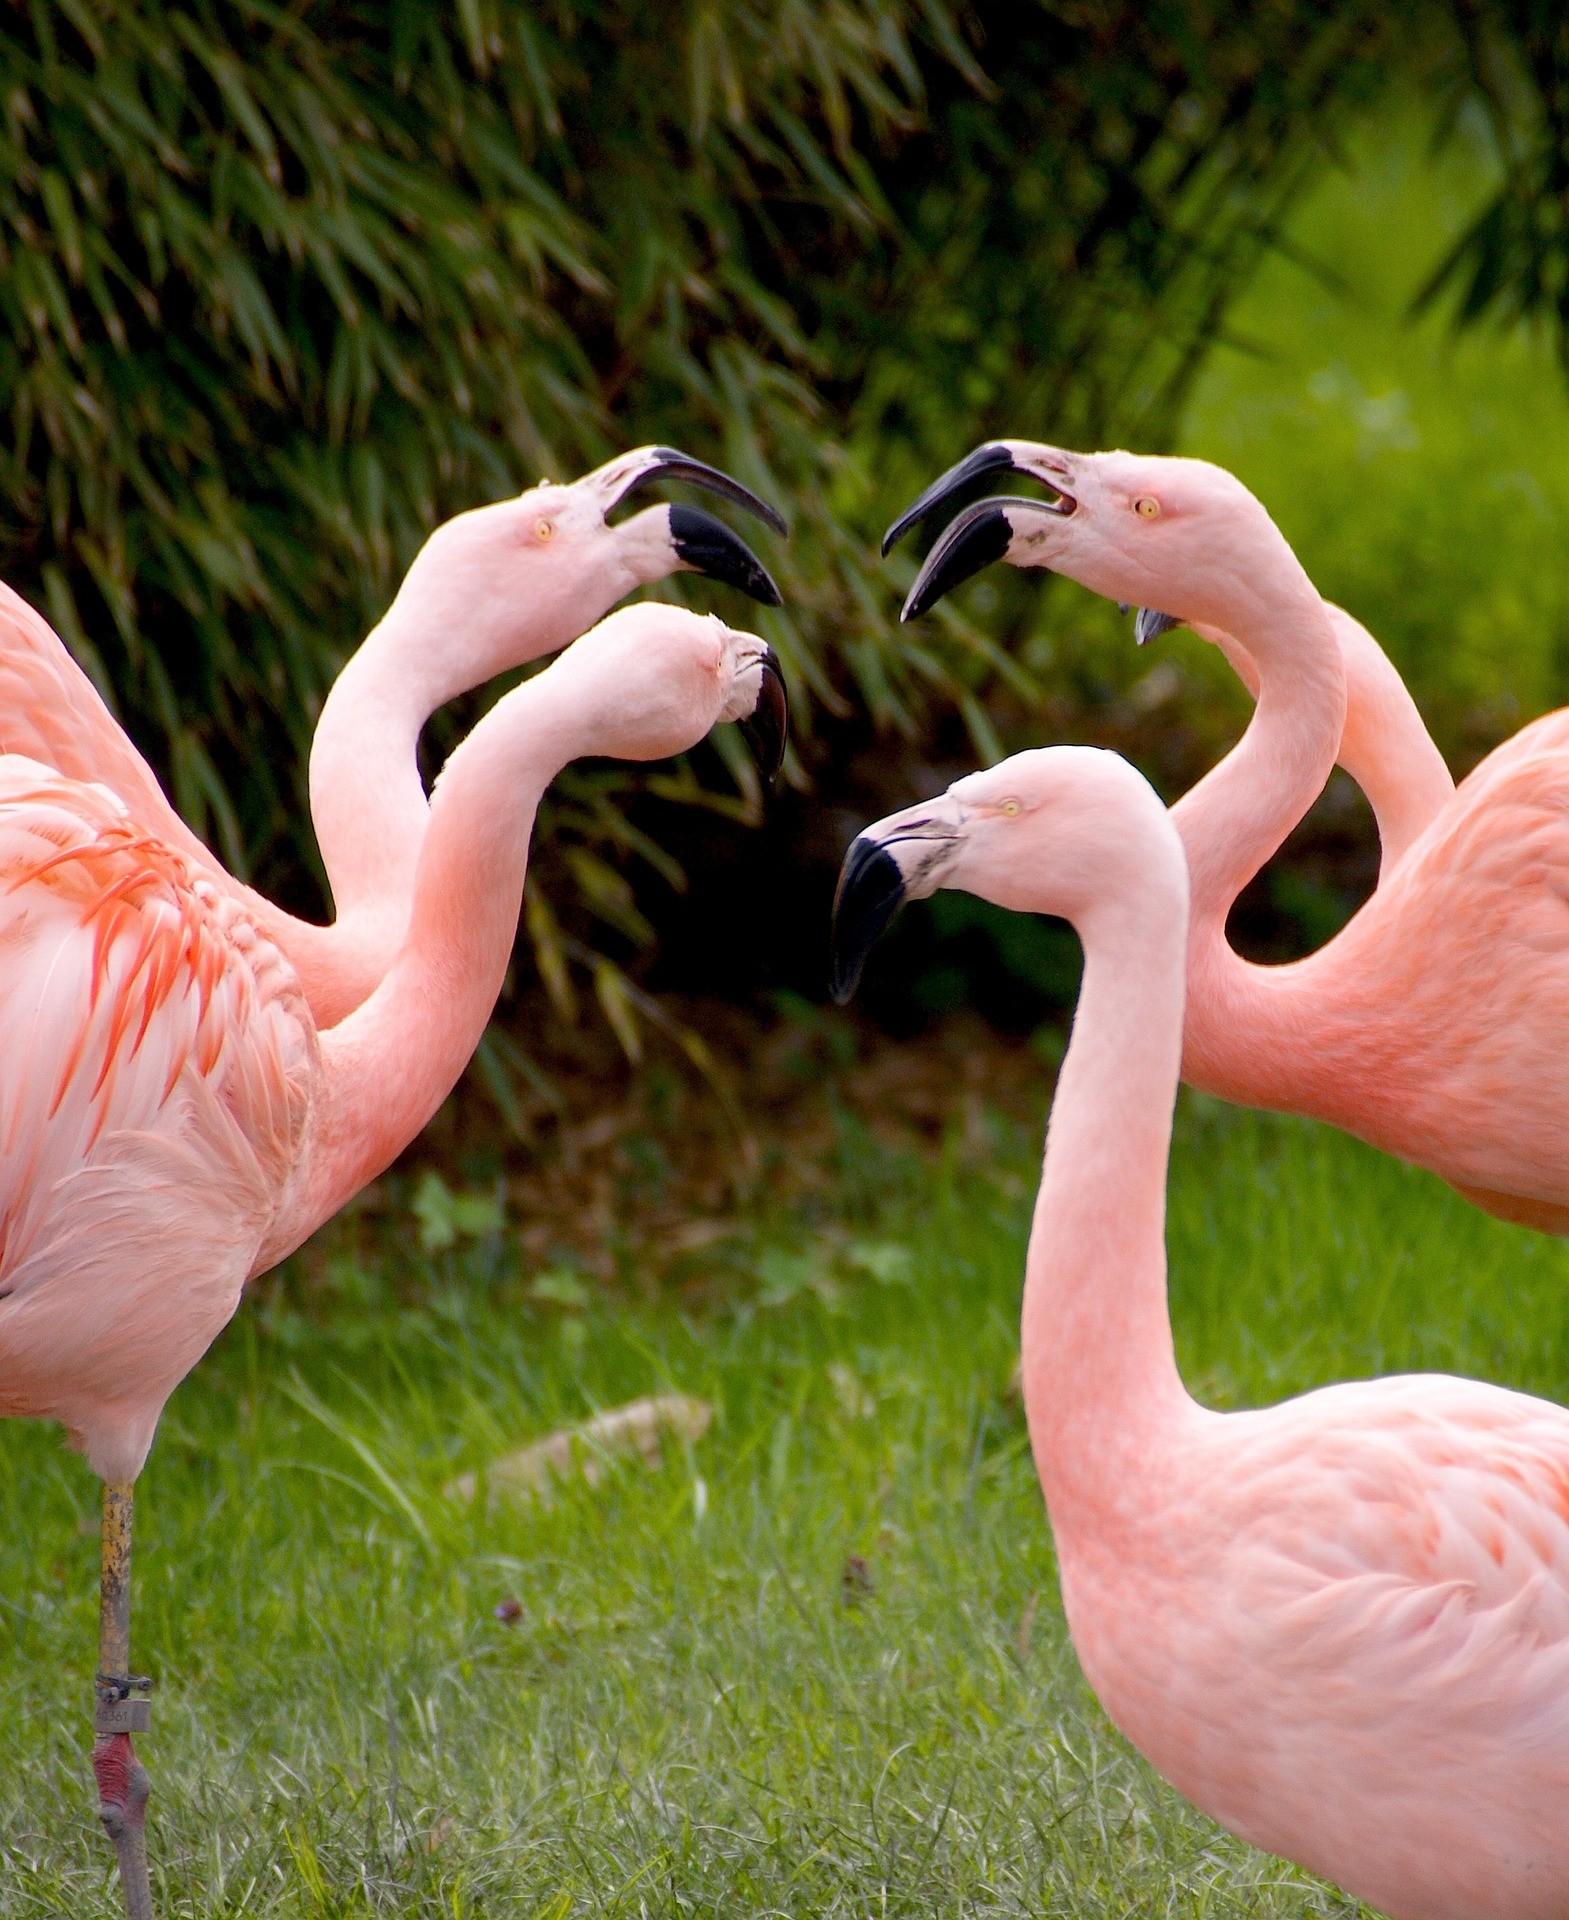 15481645374606939_by_hans3595_flamingos-1335042_1920